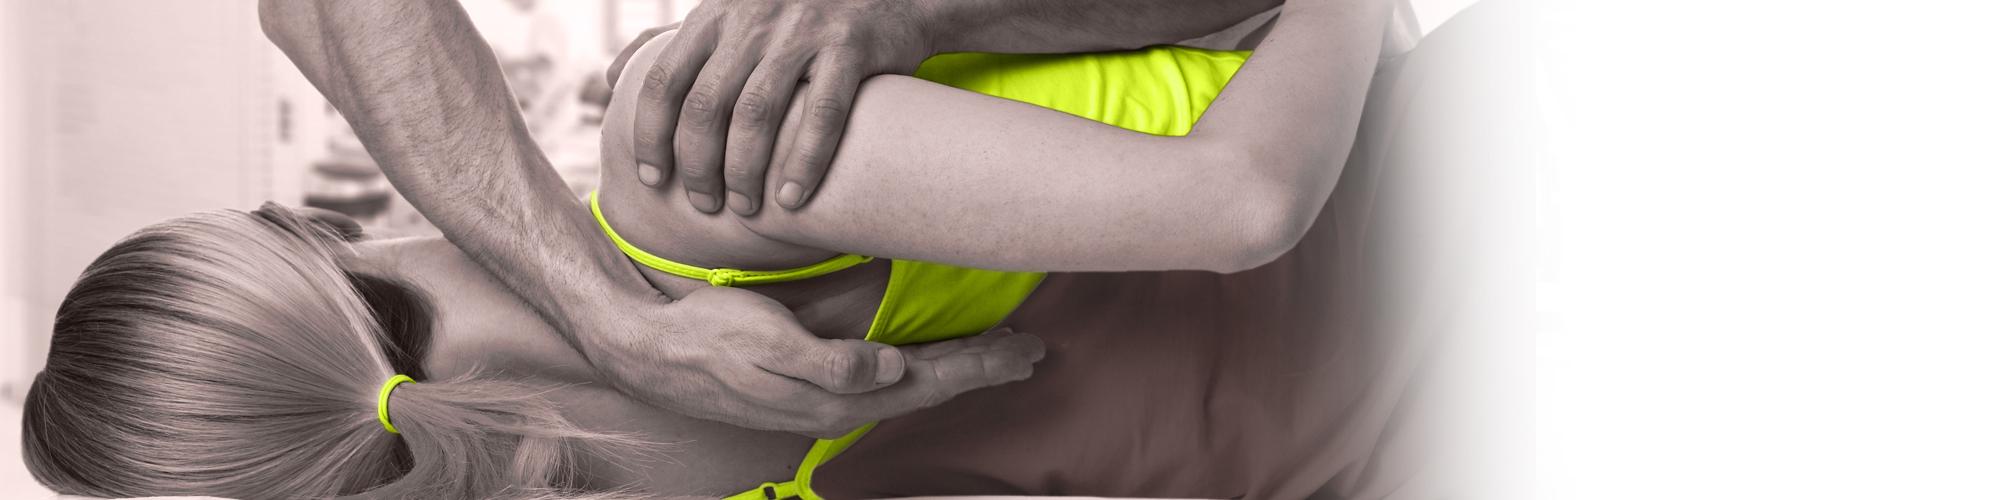 Physiotherapeut bei der Behandlung